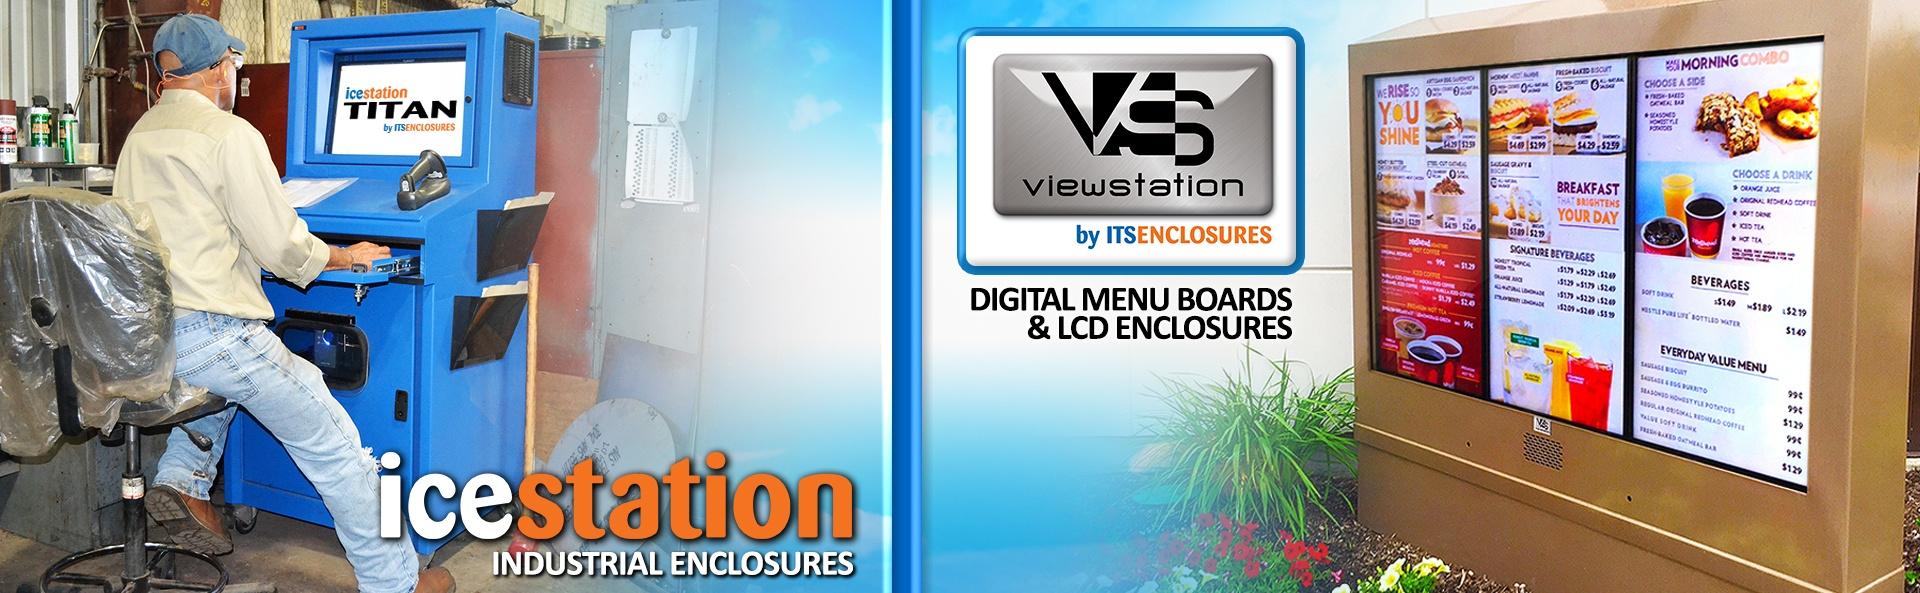 VIEWSTATION_ICESTATION_ITSENCLOSURES_COMPUTER_ENCLOSURES_LCD_DIGITAL.jpg